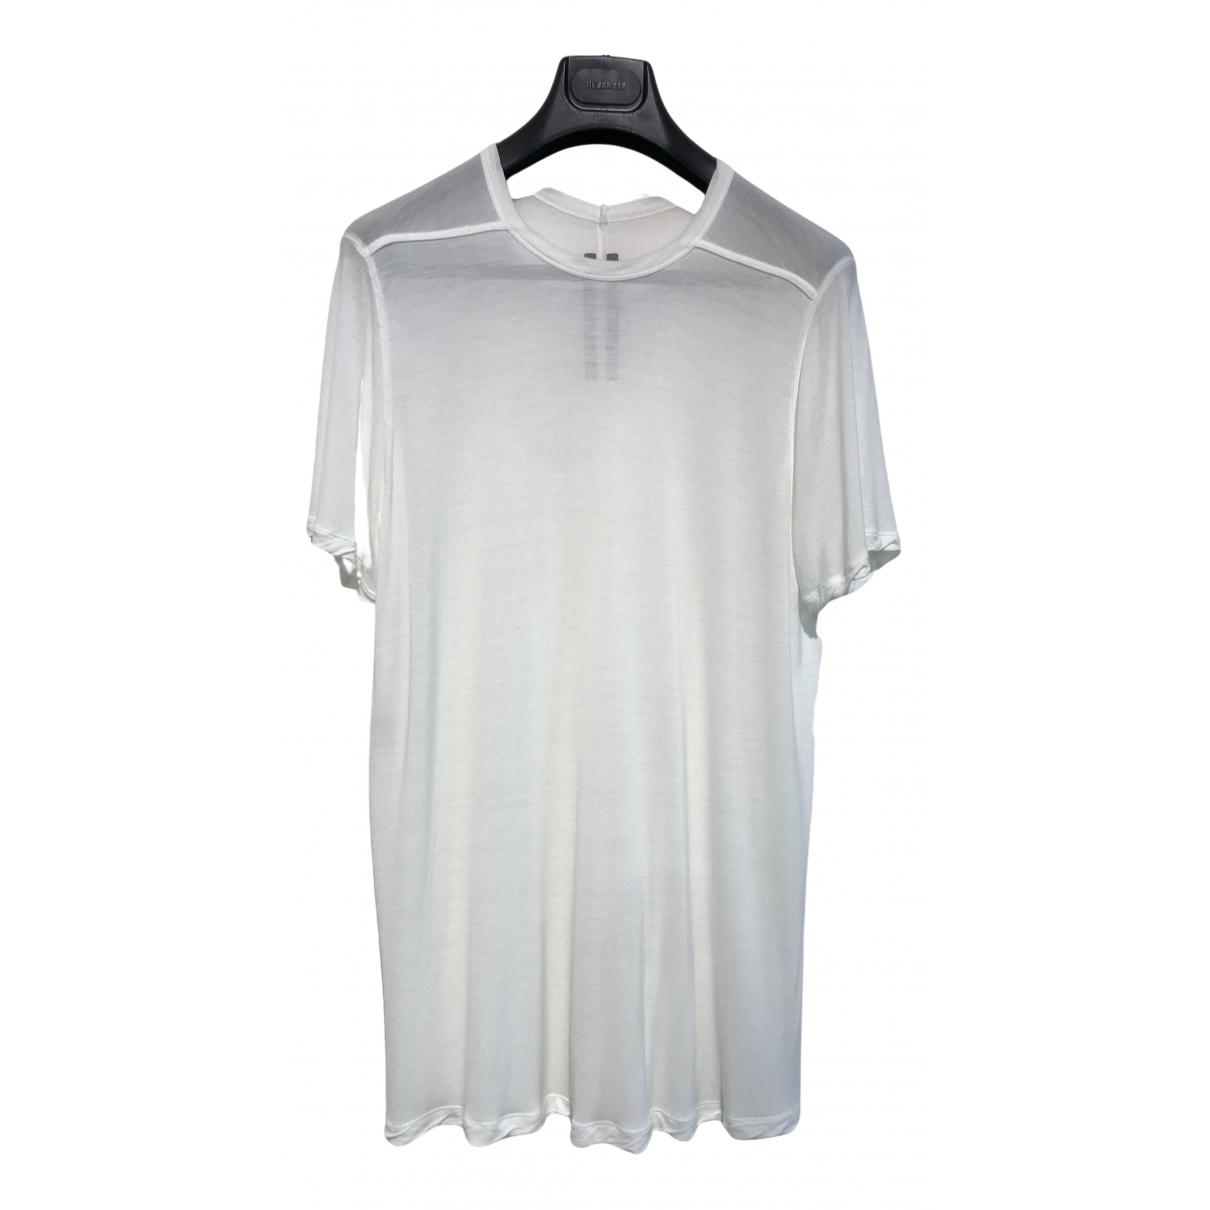 Rick Owens - Tee shirts   pour homme - blanc